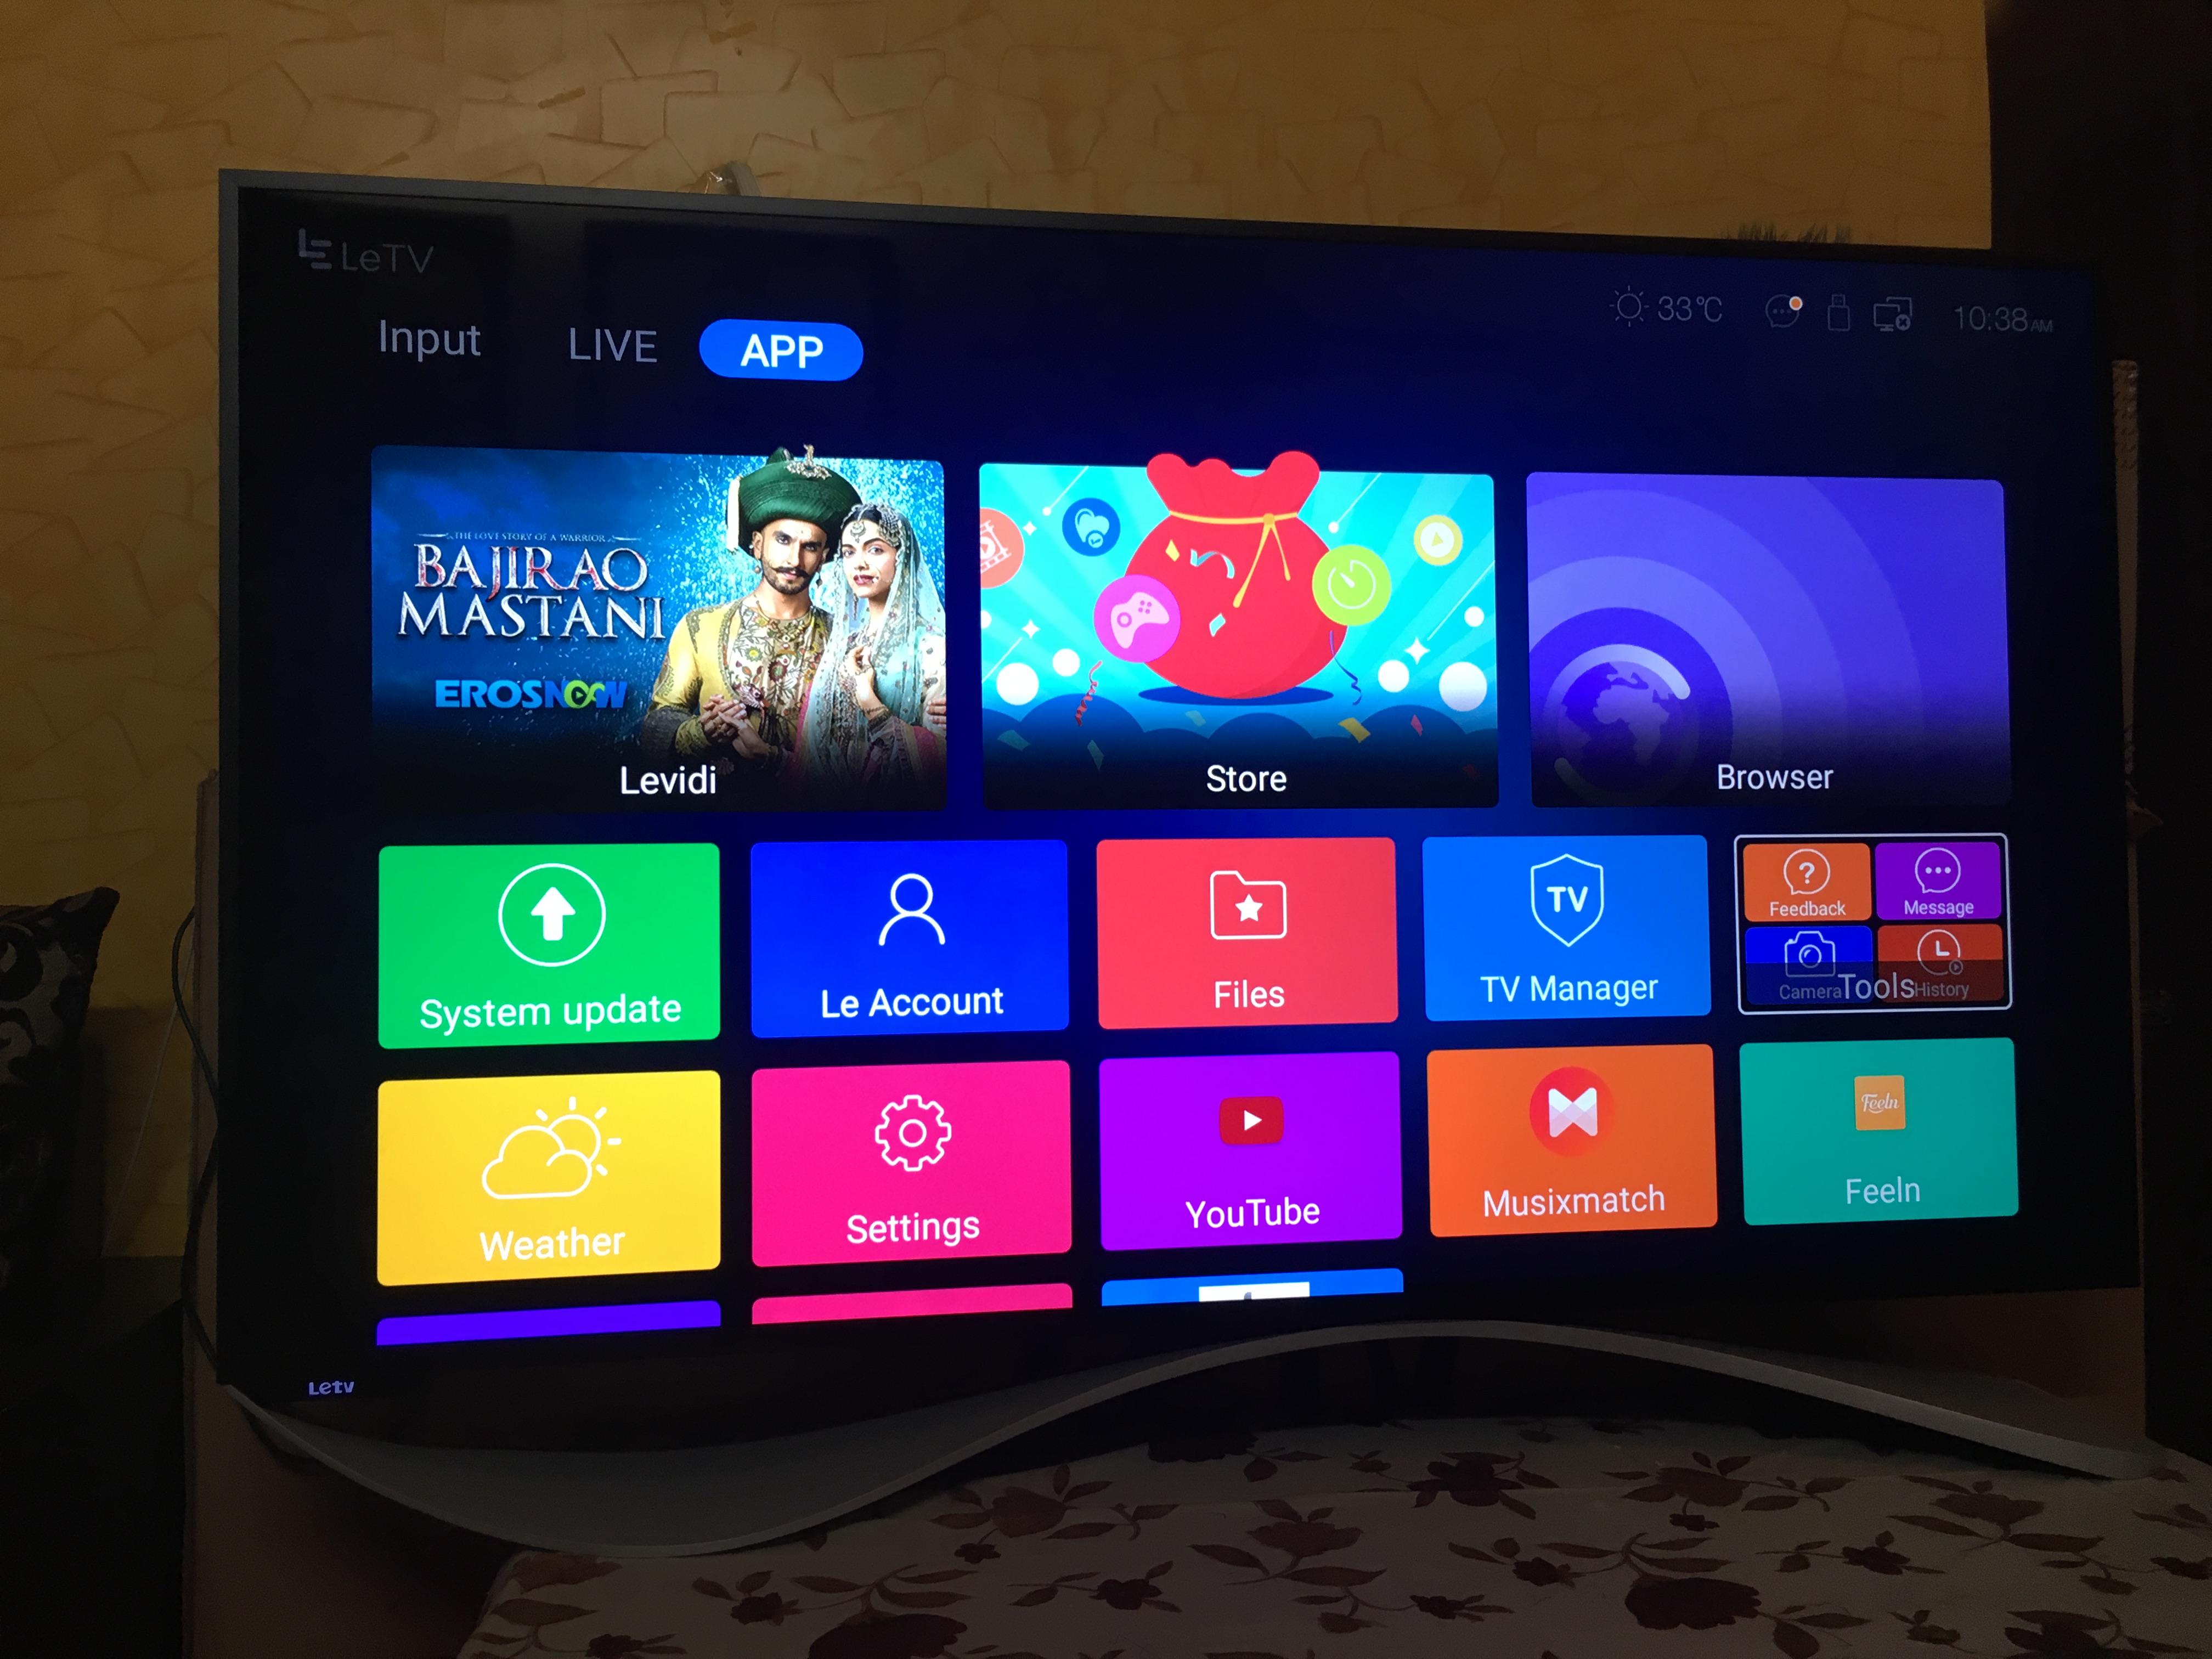 LeEco Super3 X65 4K Smart TV Review | Intellect Digest India